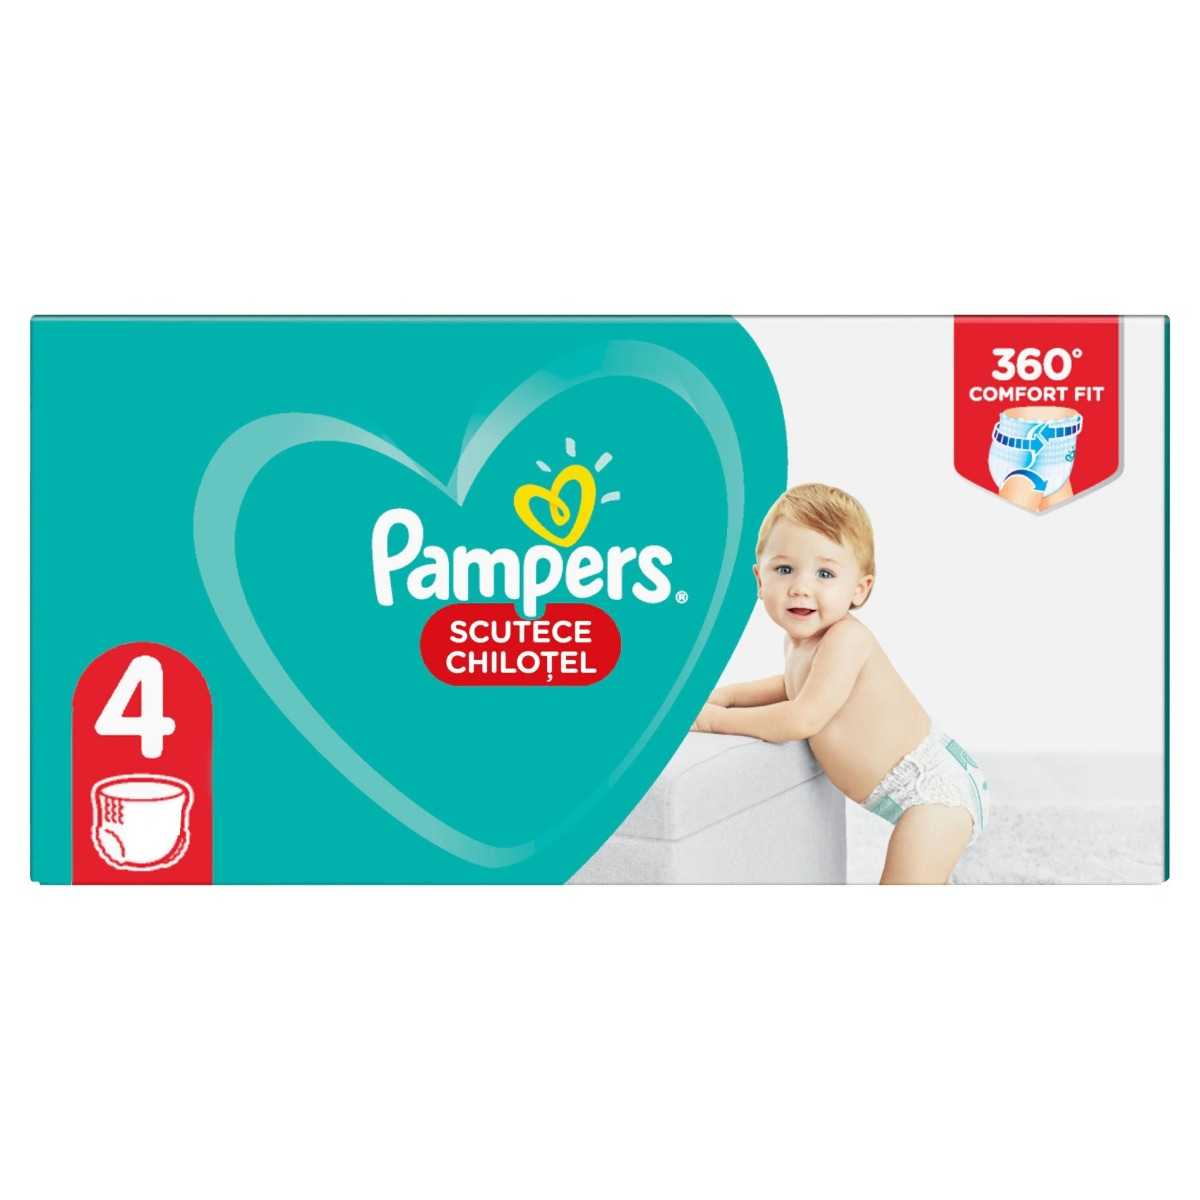 Scutece-chilotel Pants Jumbo Pack marimea 4 pentru 9-15kg, 52 bucati, Pampers drmax.ro